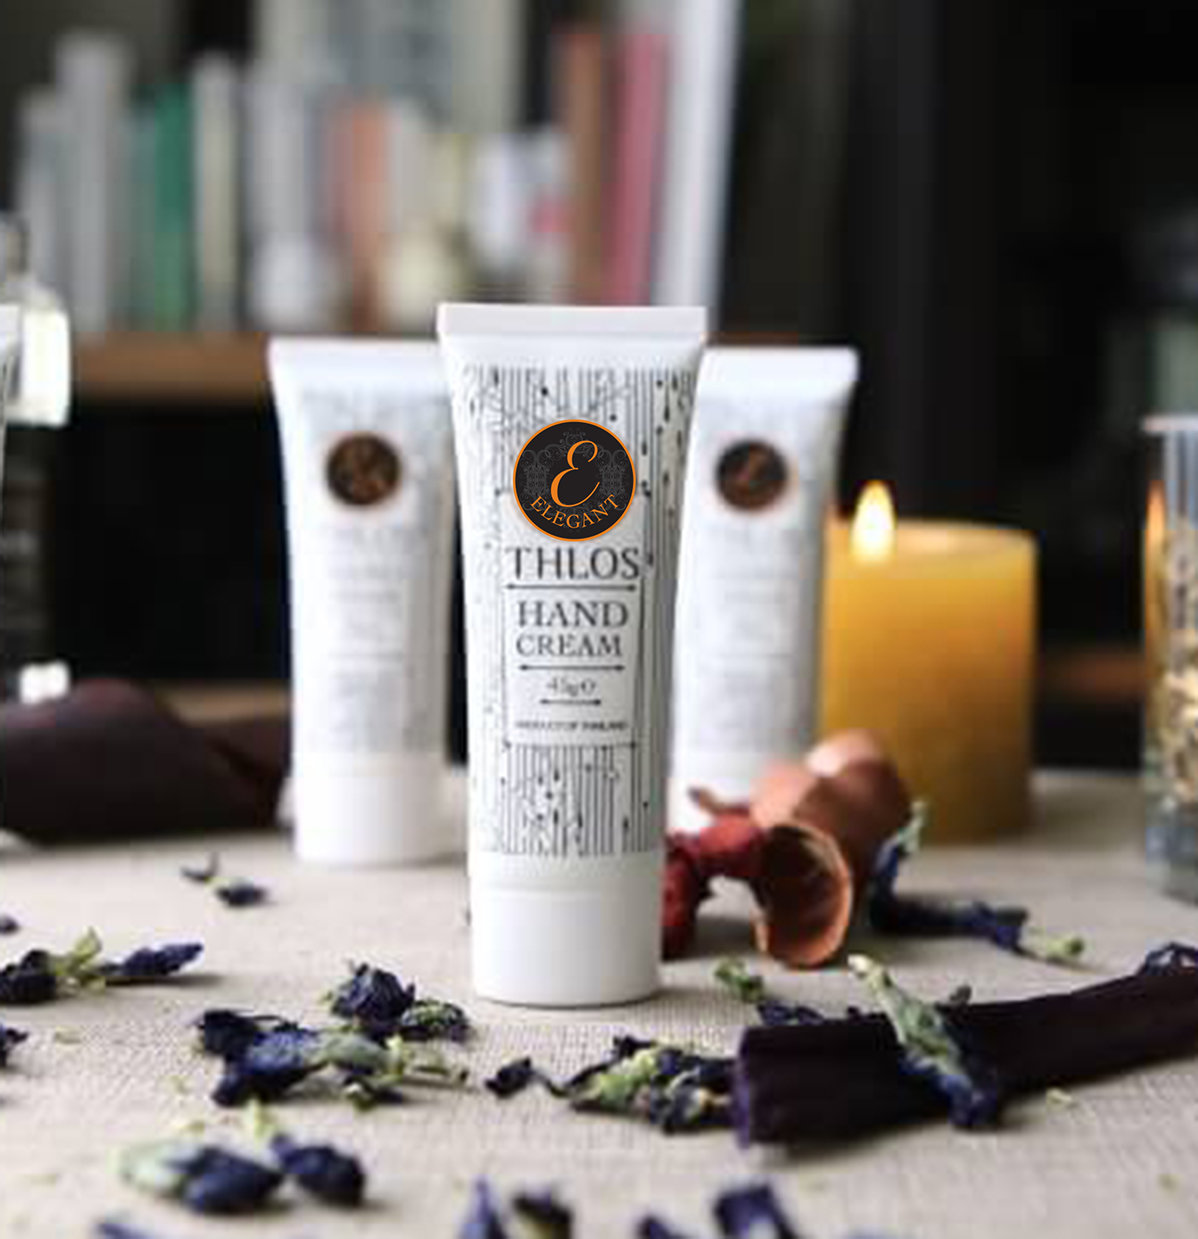 Elegant Hand Cream : ครีมทามือกลิ่นแอลลาแกน